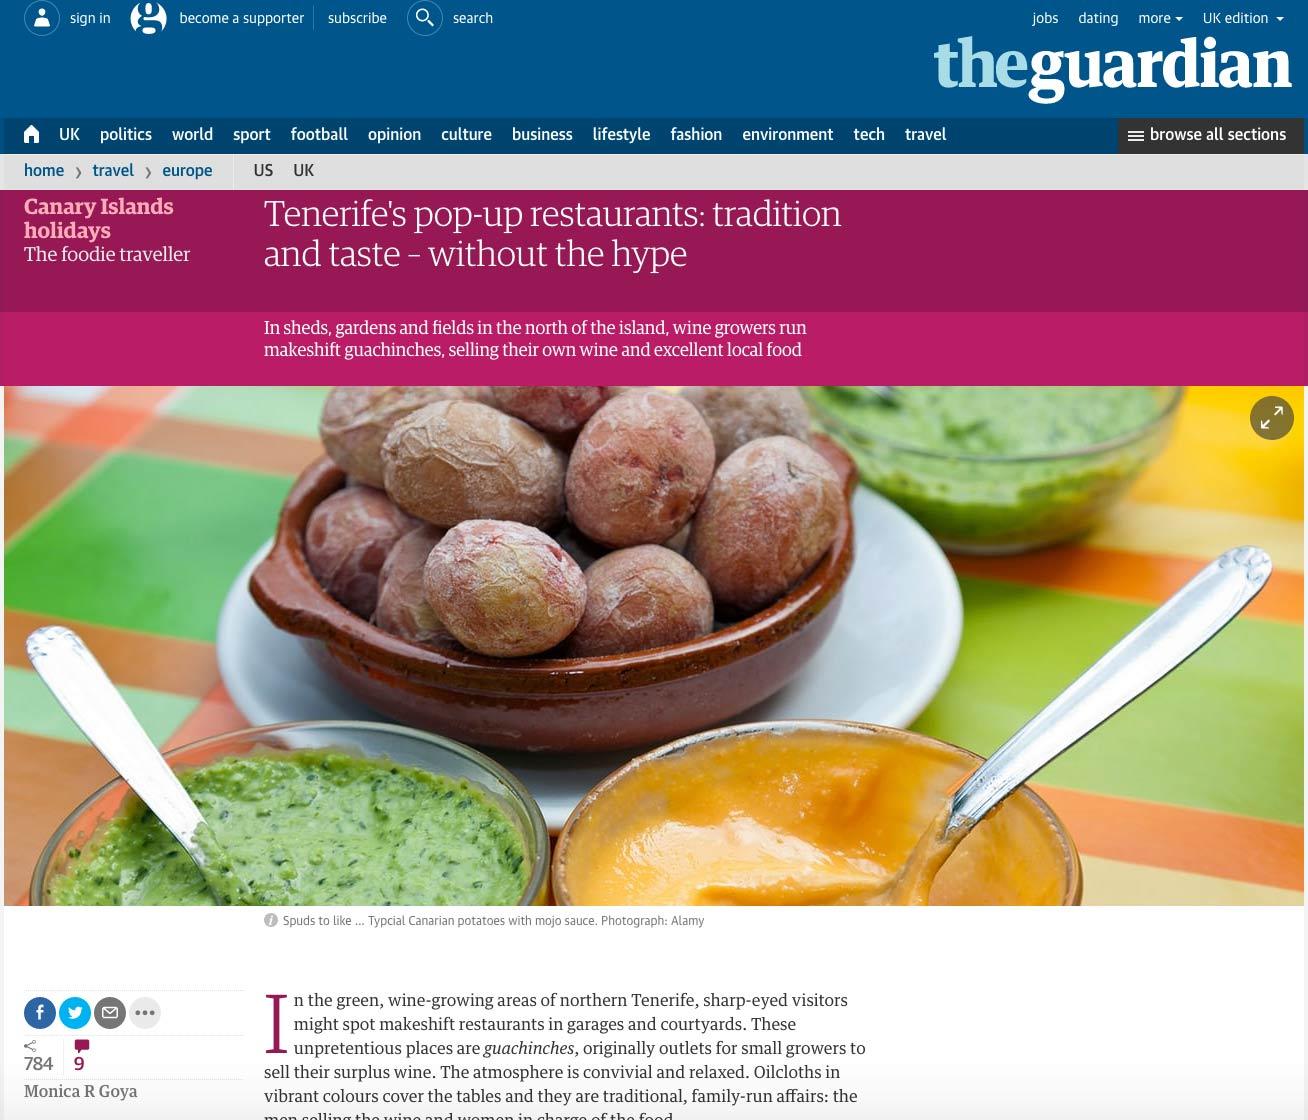 The-Guardian-guachinches-1.jpg